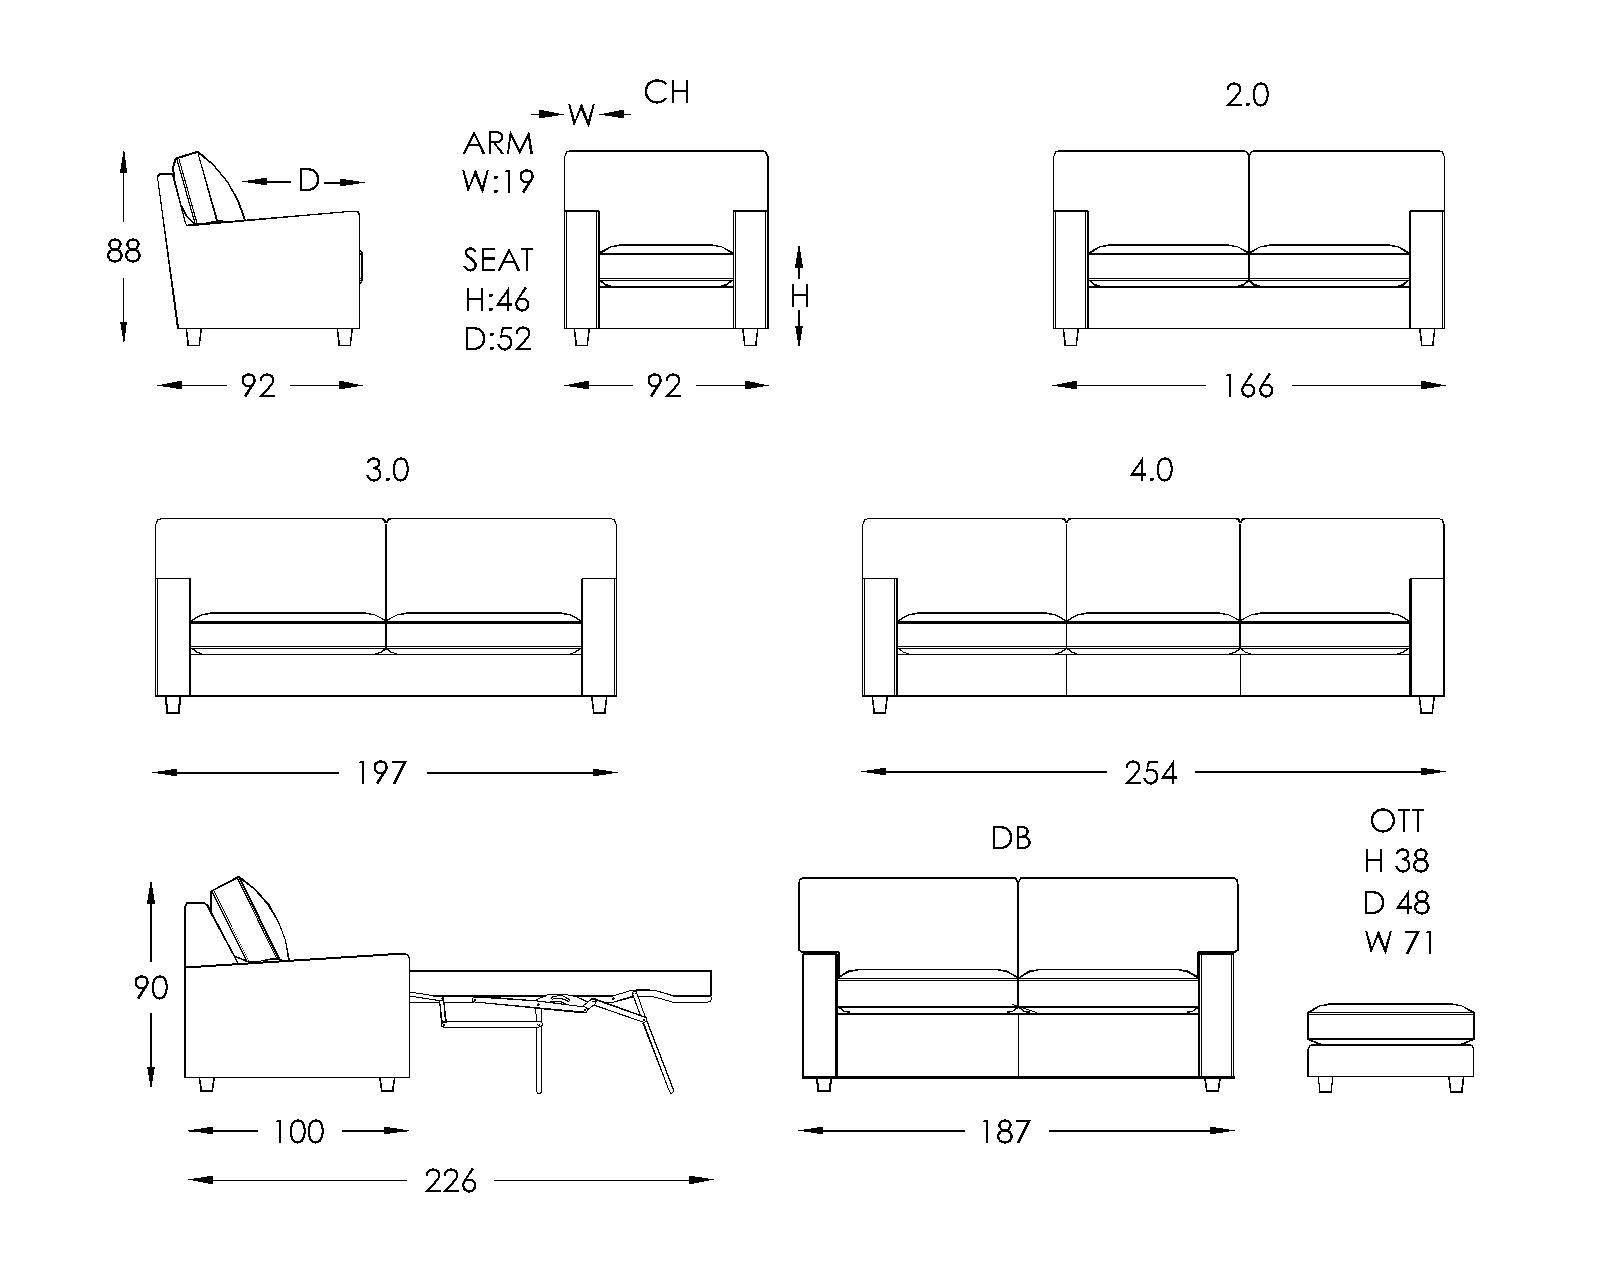 Sofa Drawing Details New Blog Wallpapers Sofa Drawing Drawings Blog Wallpaper